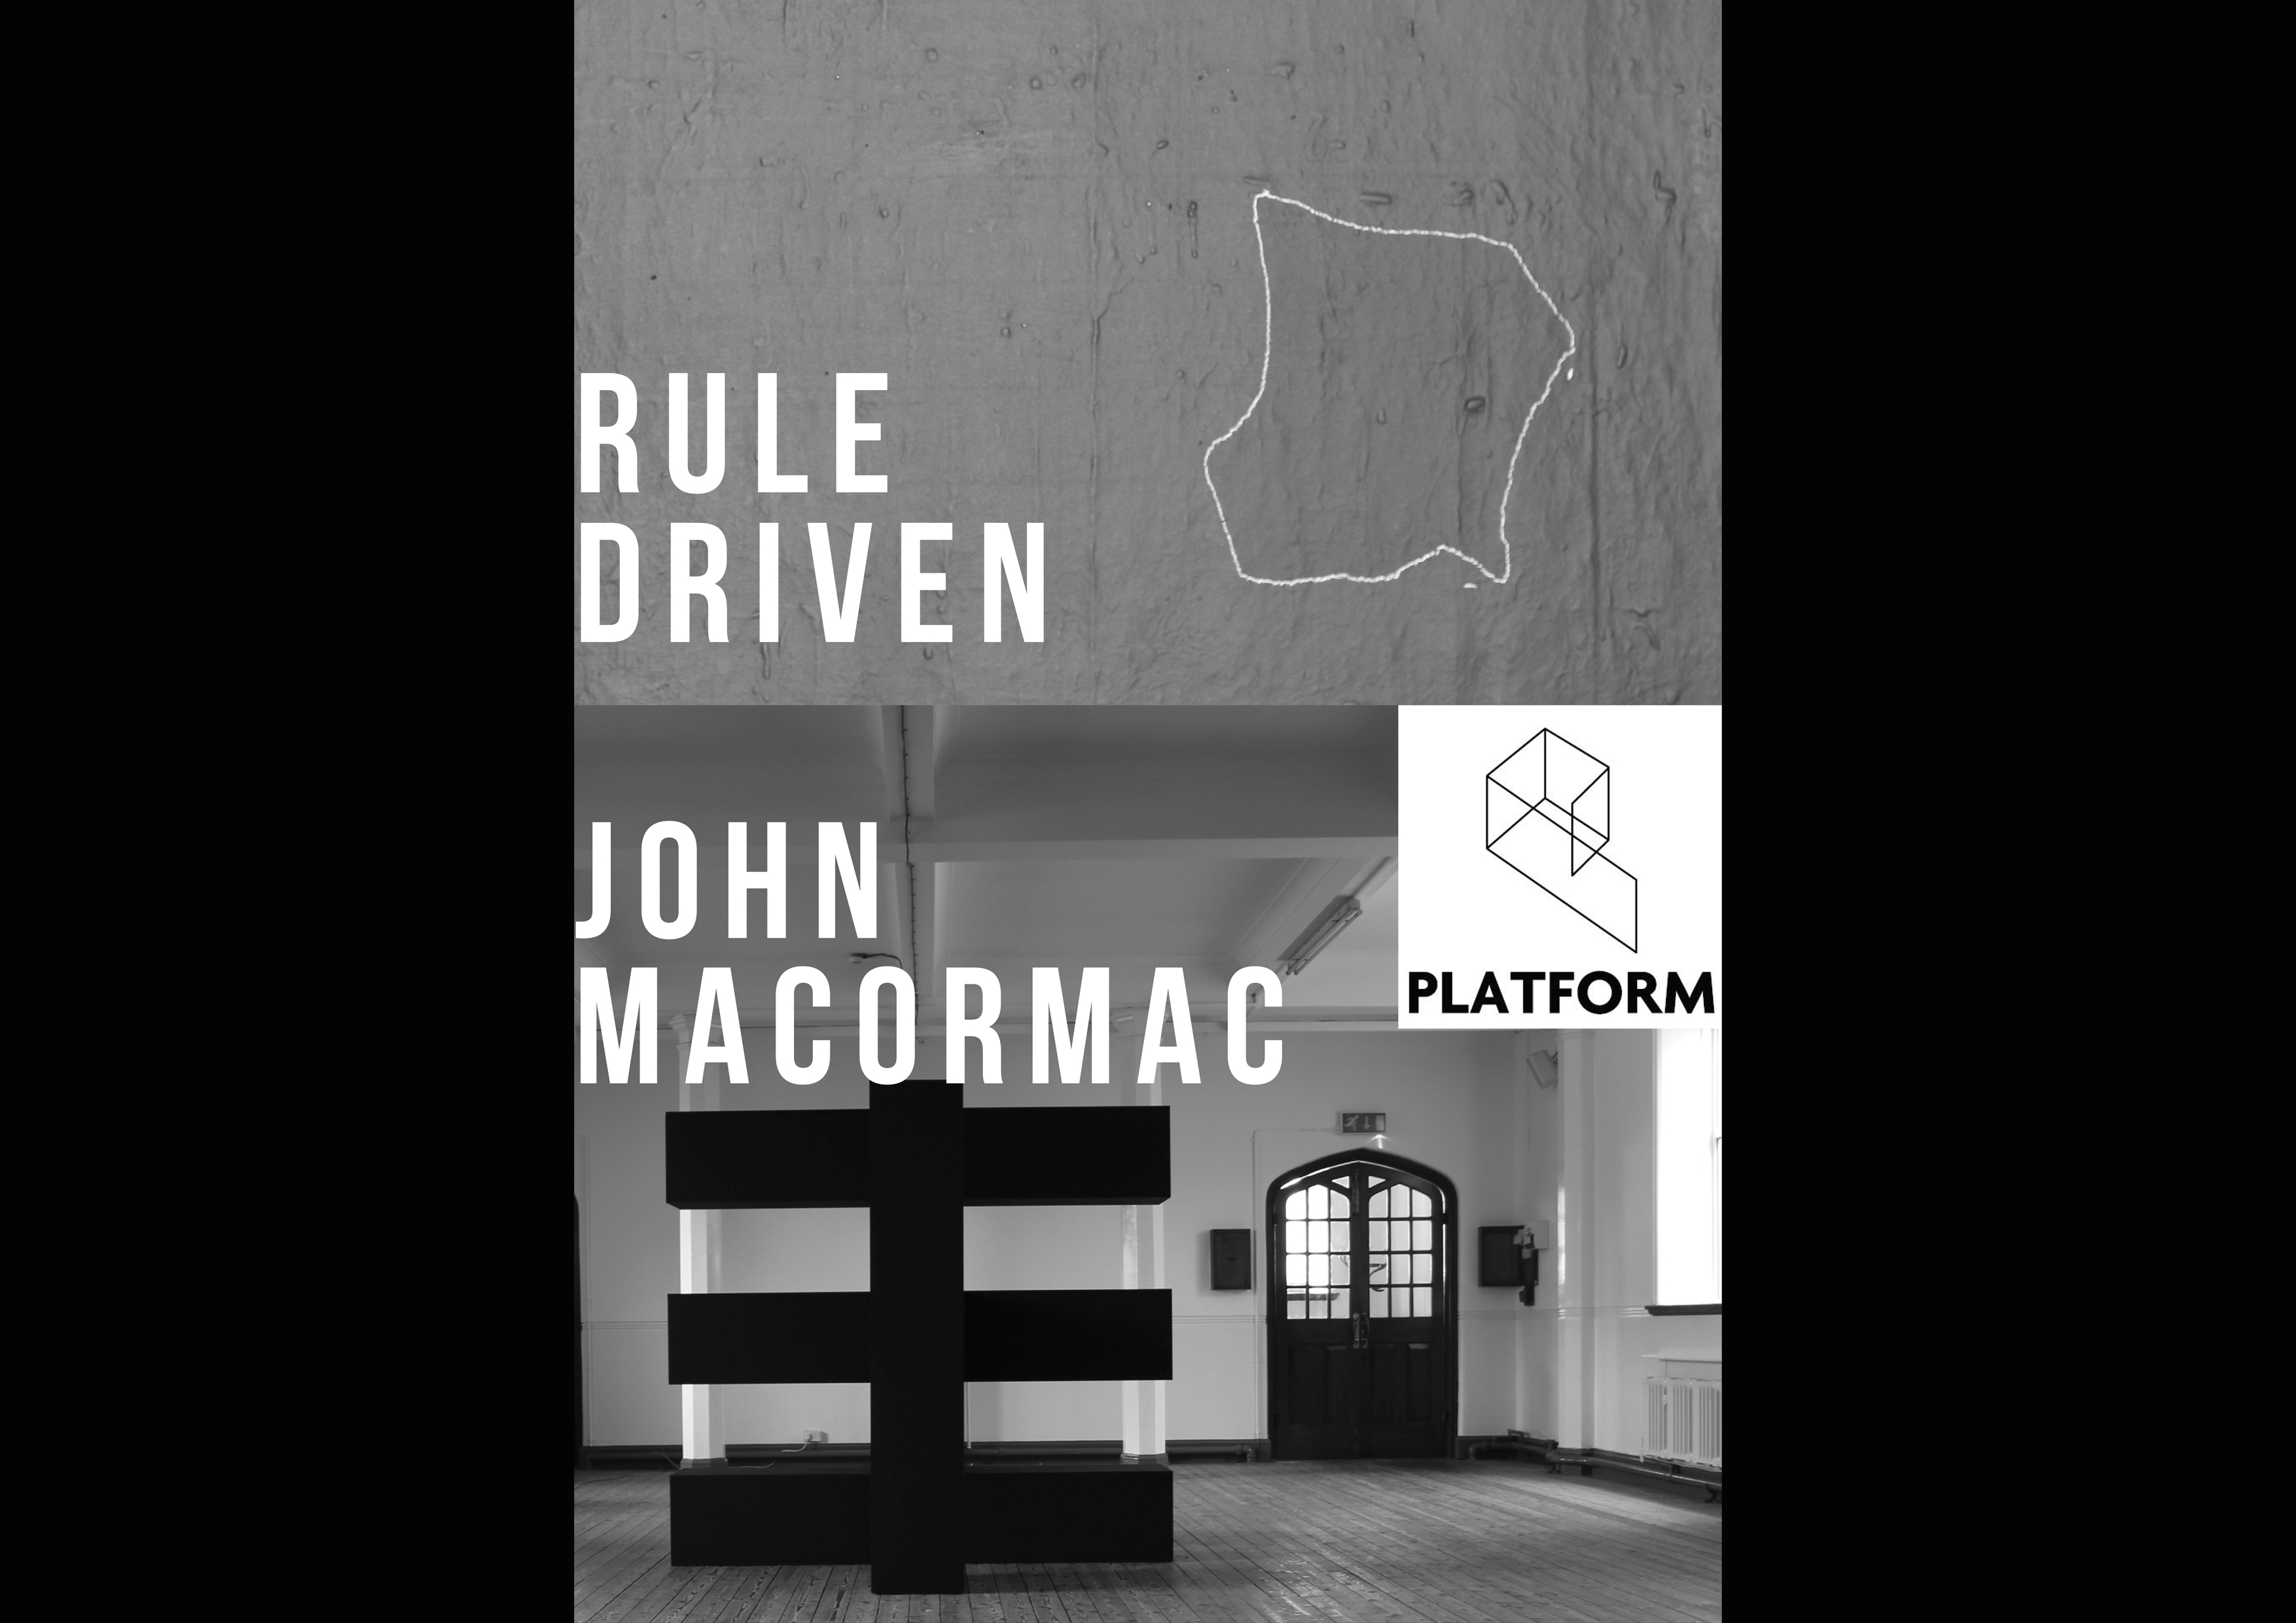 Rule Driven John Macormac